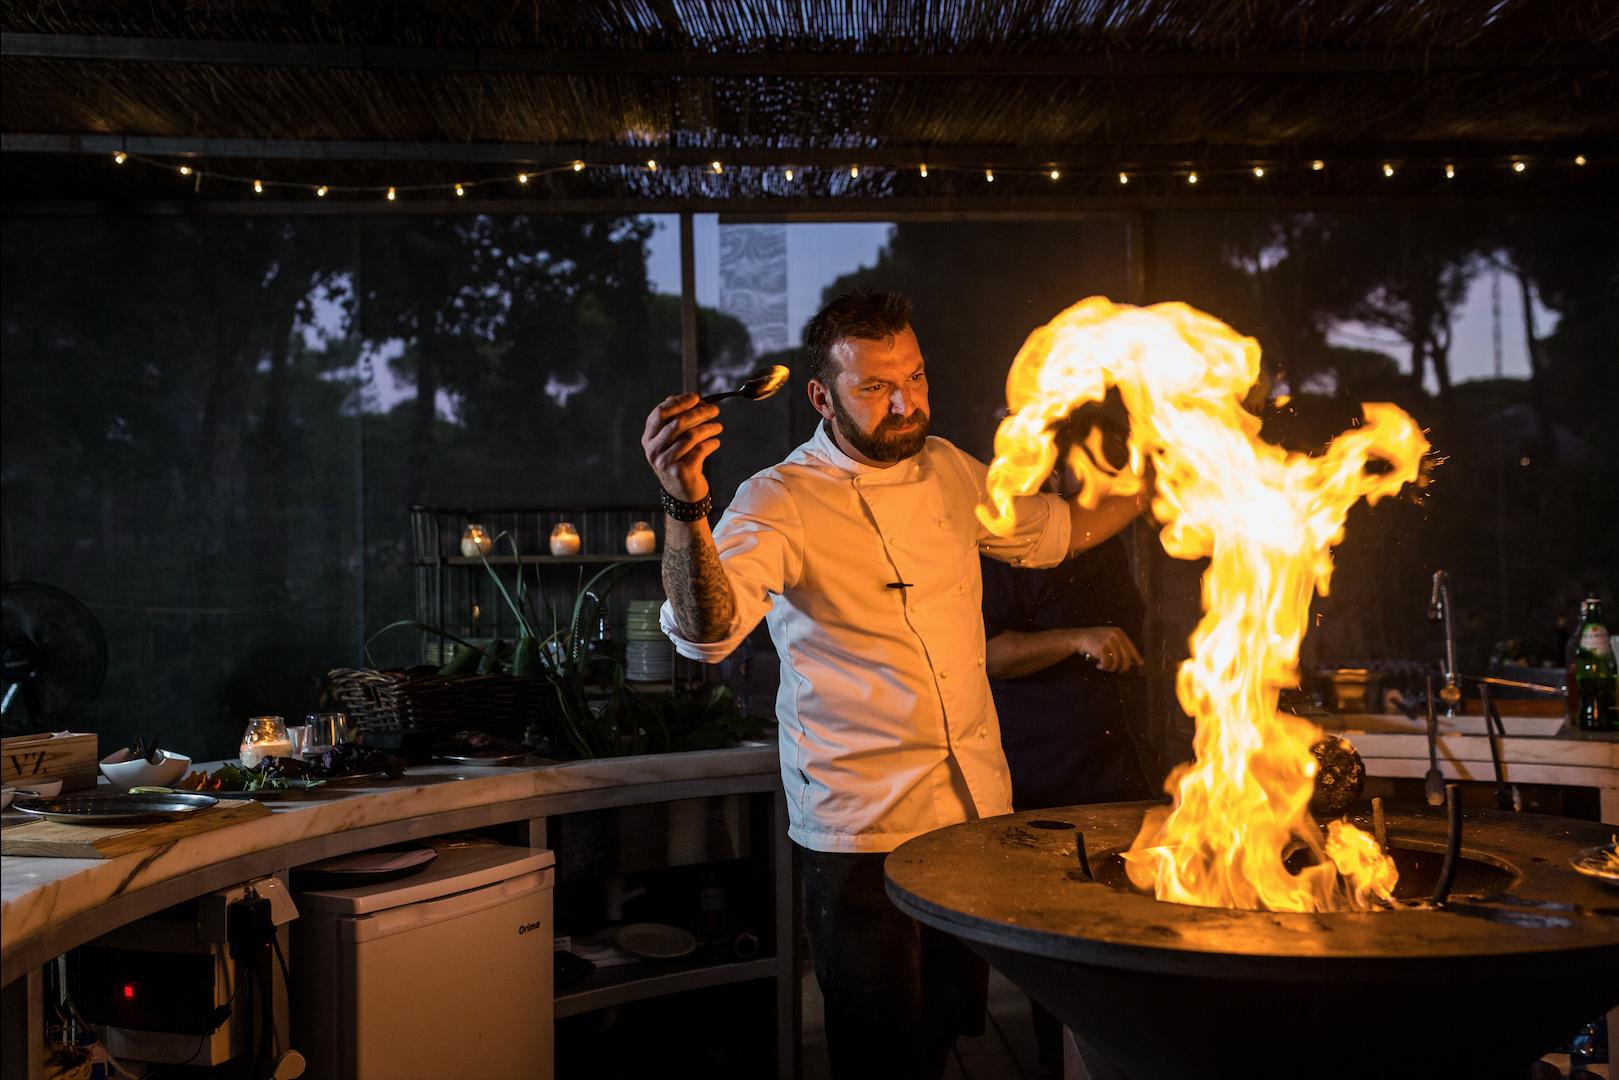 Na 'Hell's Kitchen' de Ljubomir Stanisic só interessa saber cozinhar